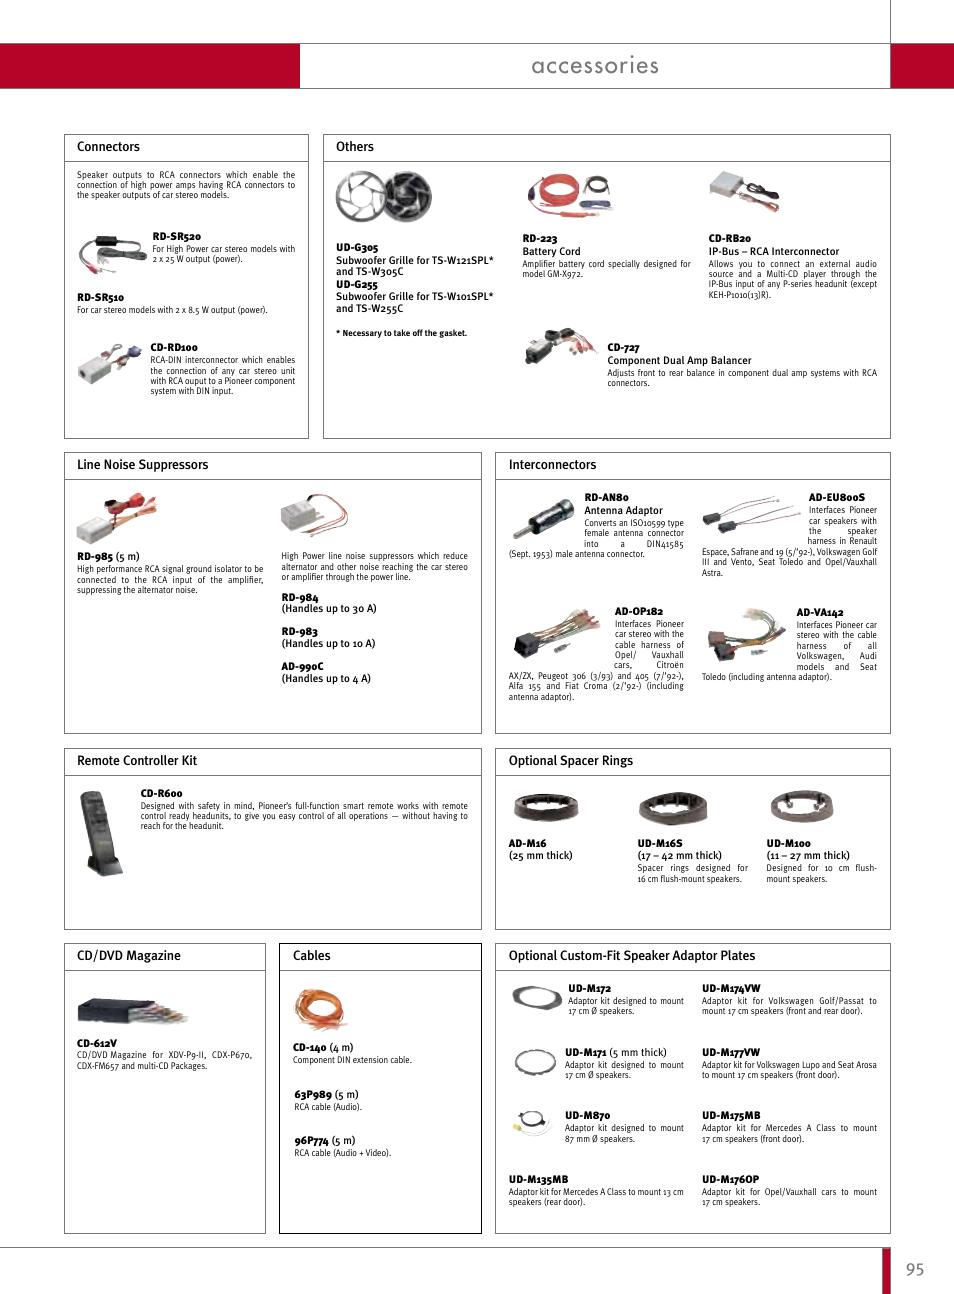 accessories pioneer reference series dex p9r user manual page 45 rh manualsdir com